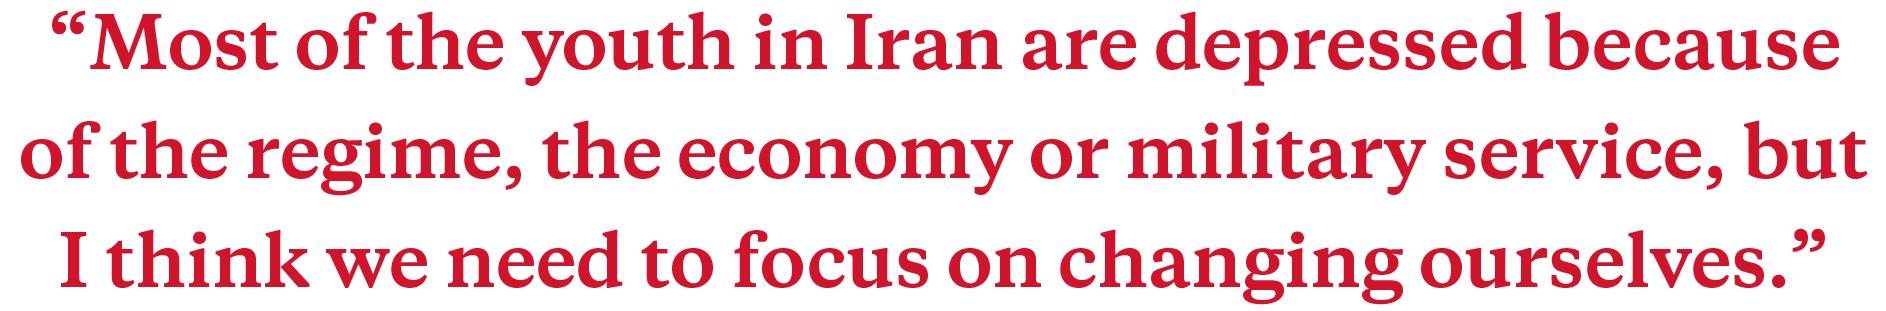 iran-quote-3